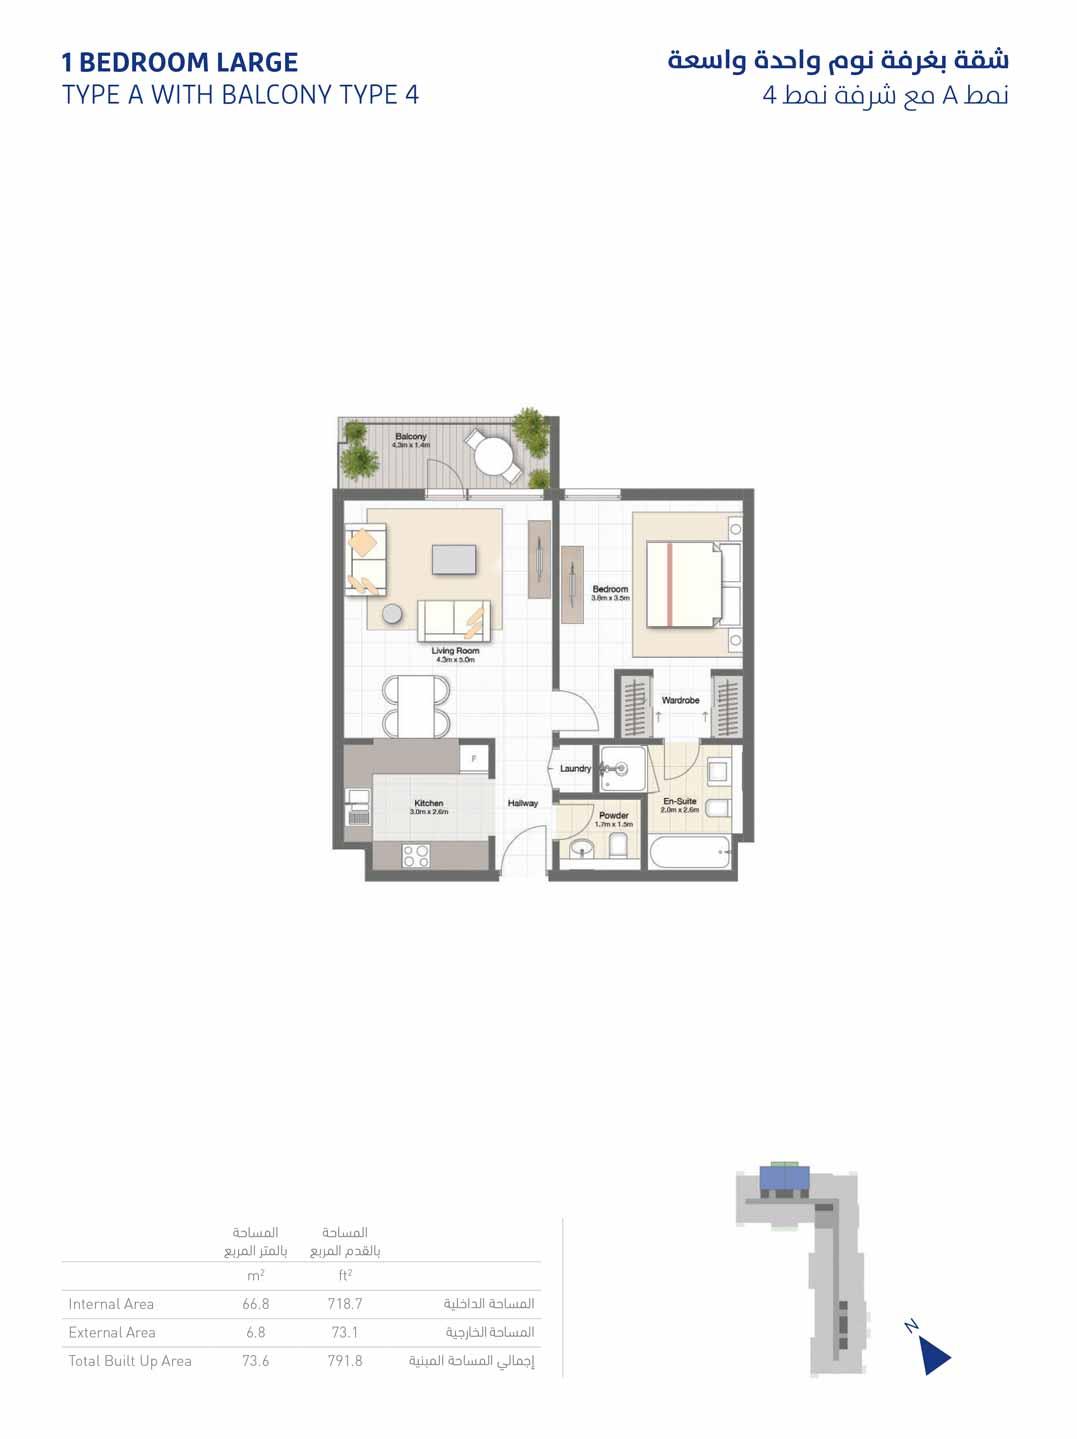 1 bedroom-Large-type-A-balcony-type-4-791